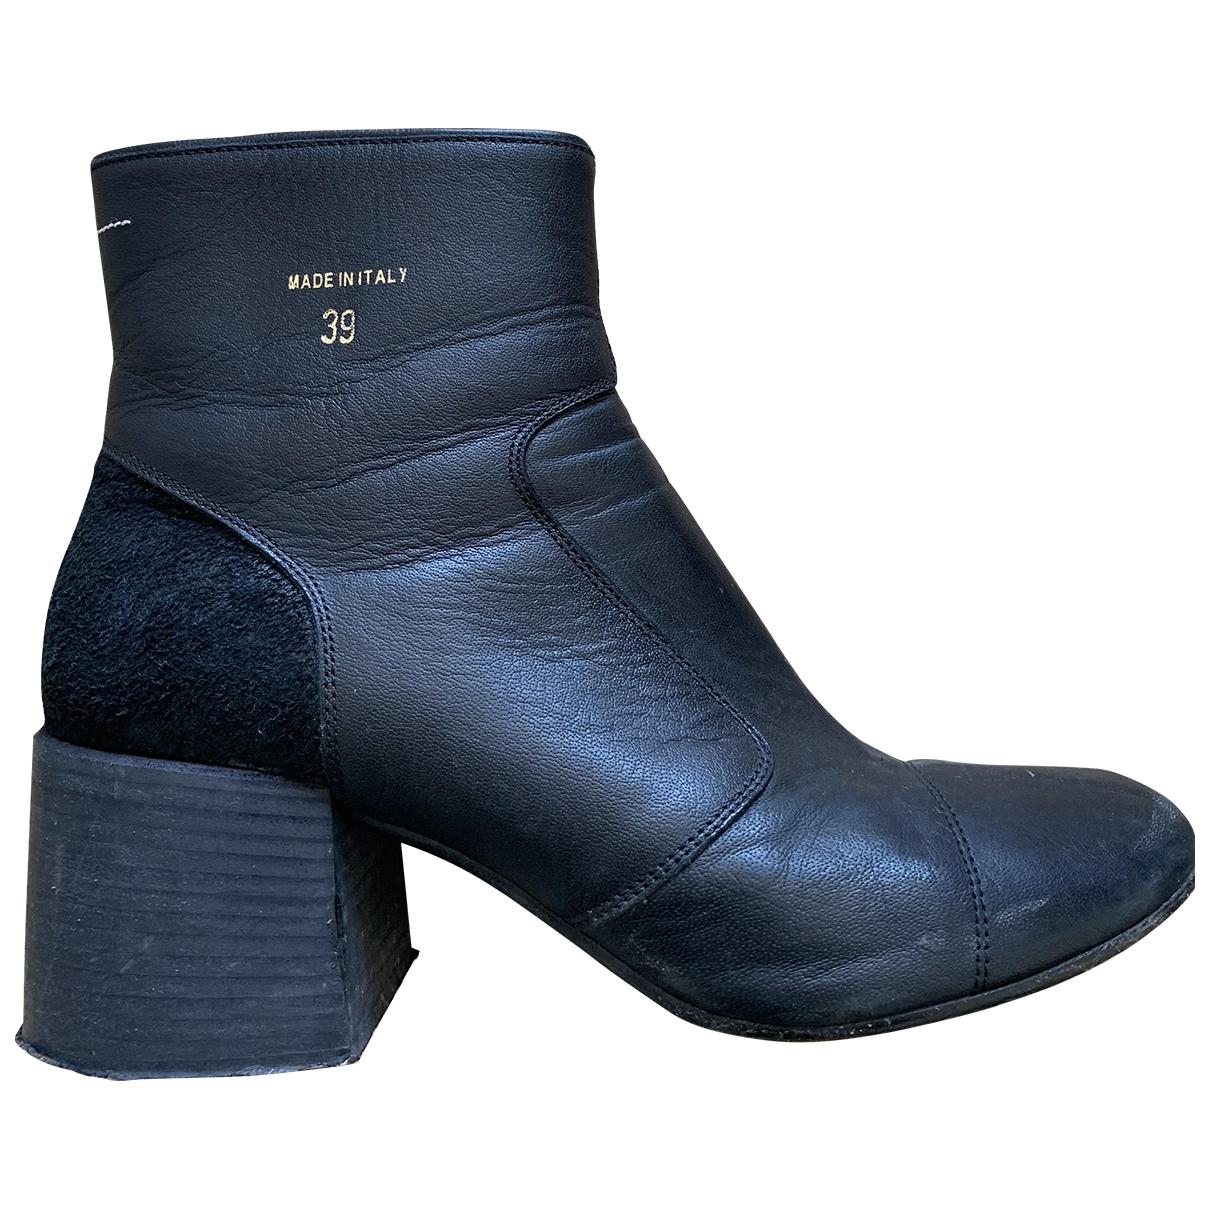 Mm6 \N Stiefel in  Schwarz Leder